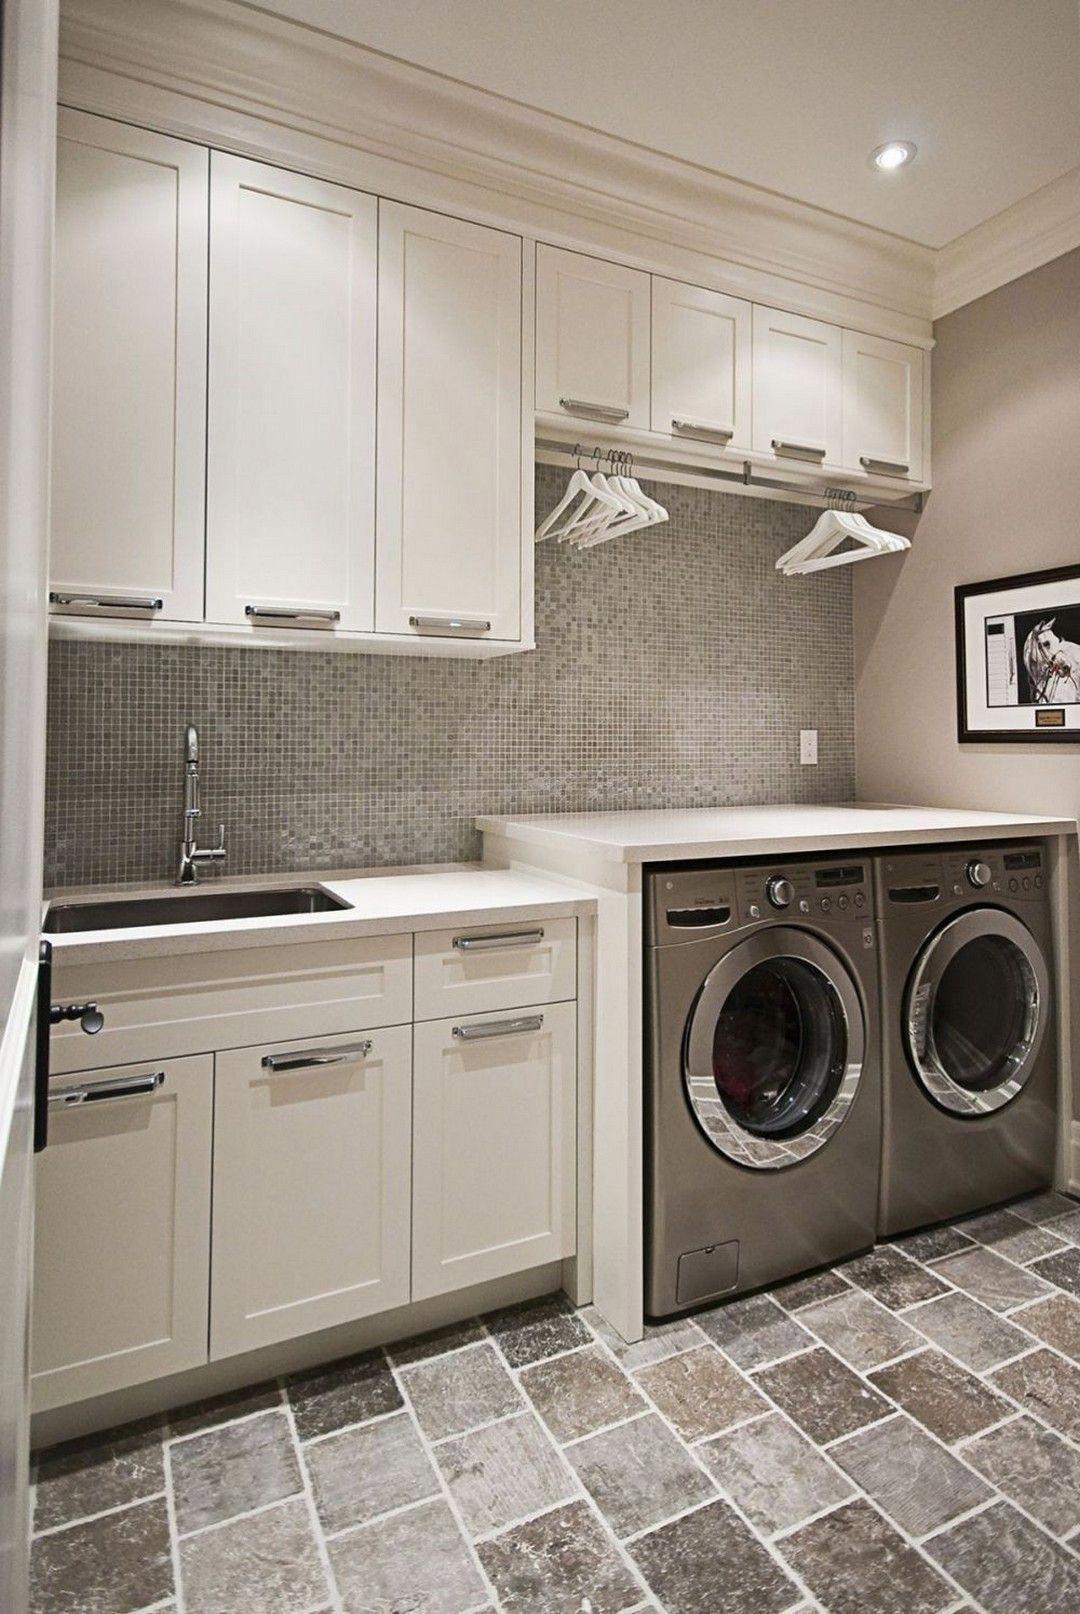 Cabi Cabinet Diy Ideas Laundry Laundryroom Pegboard Ideas Pegboard Ideas Art Pegboard Ideas Bat Laundry Room Tile Laundry Room Diy Laundry Room Design